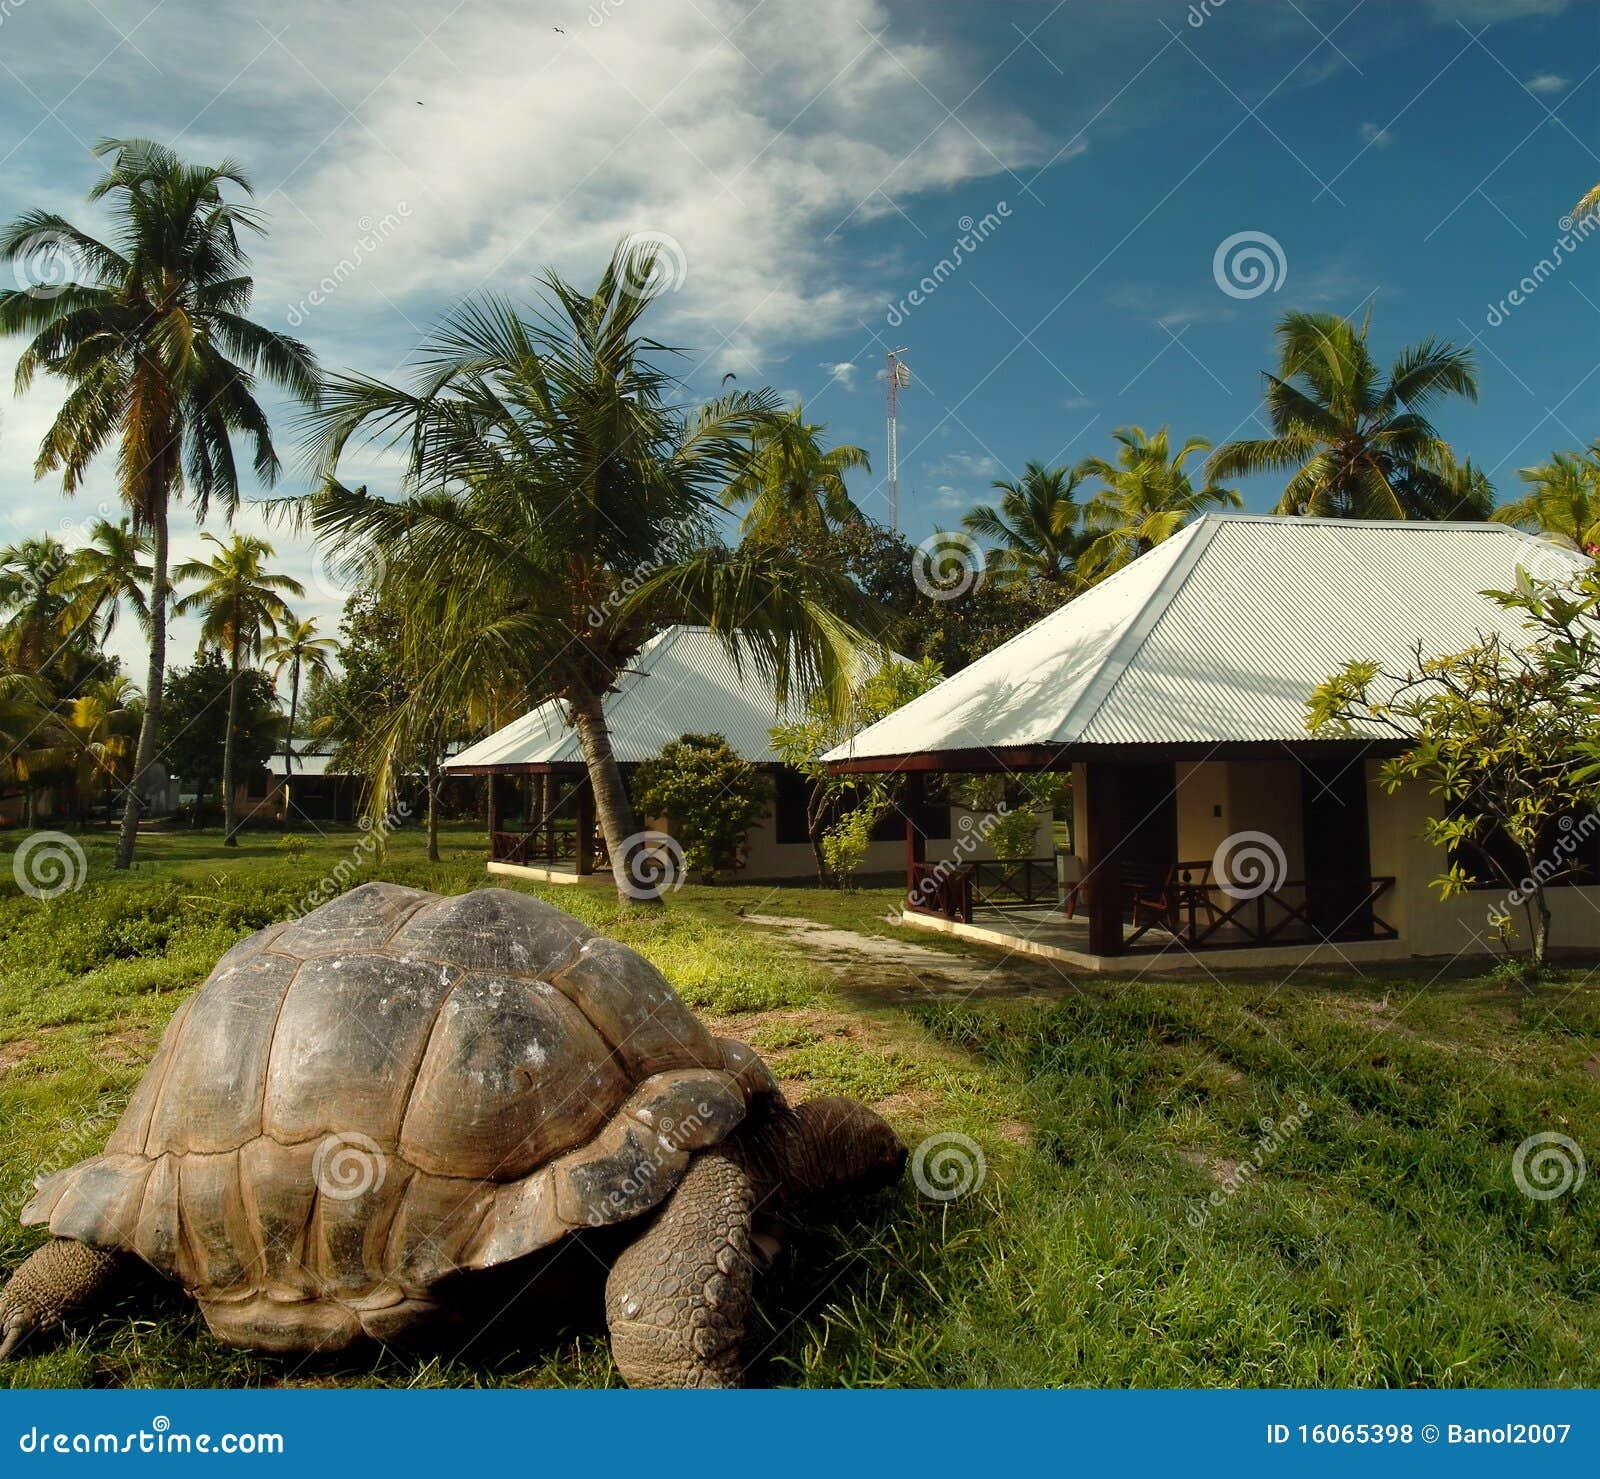 los piratas de la isla tortuga: